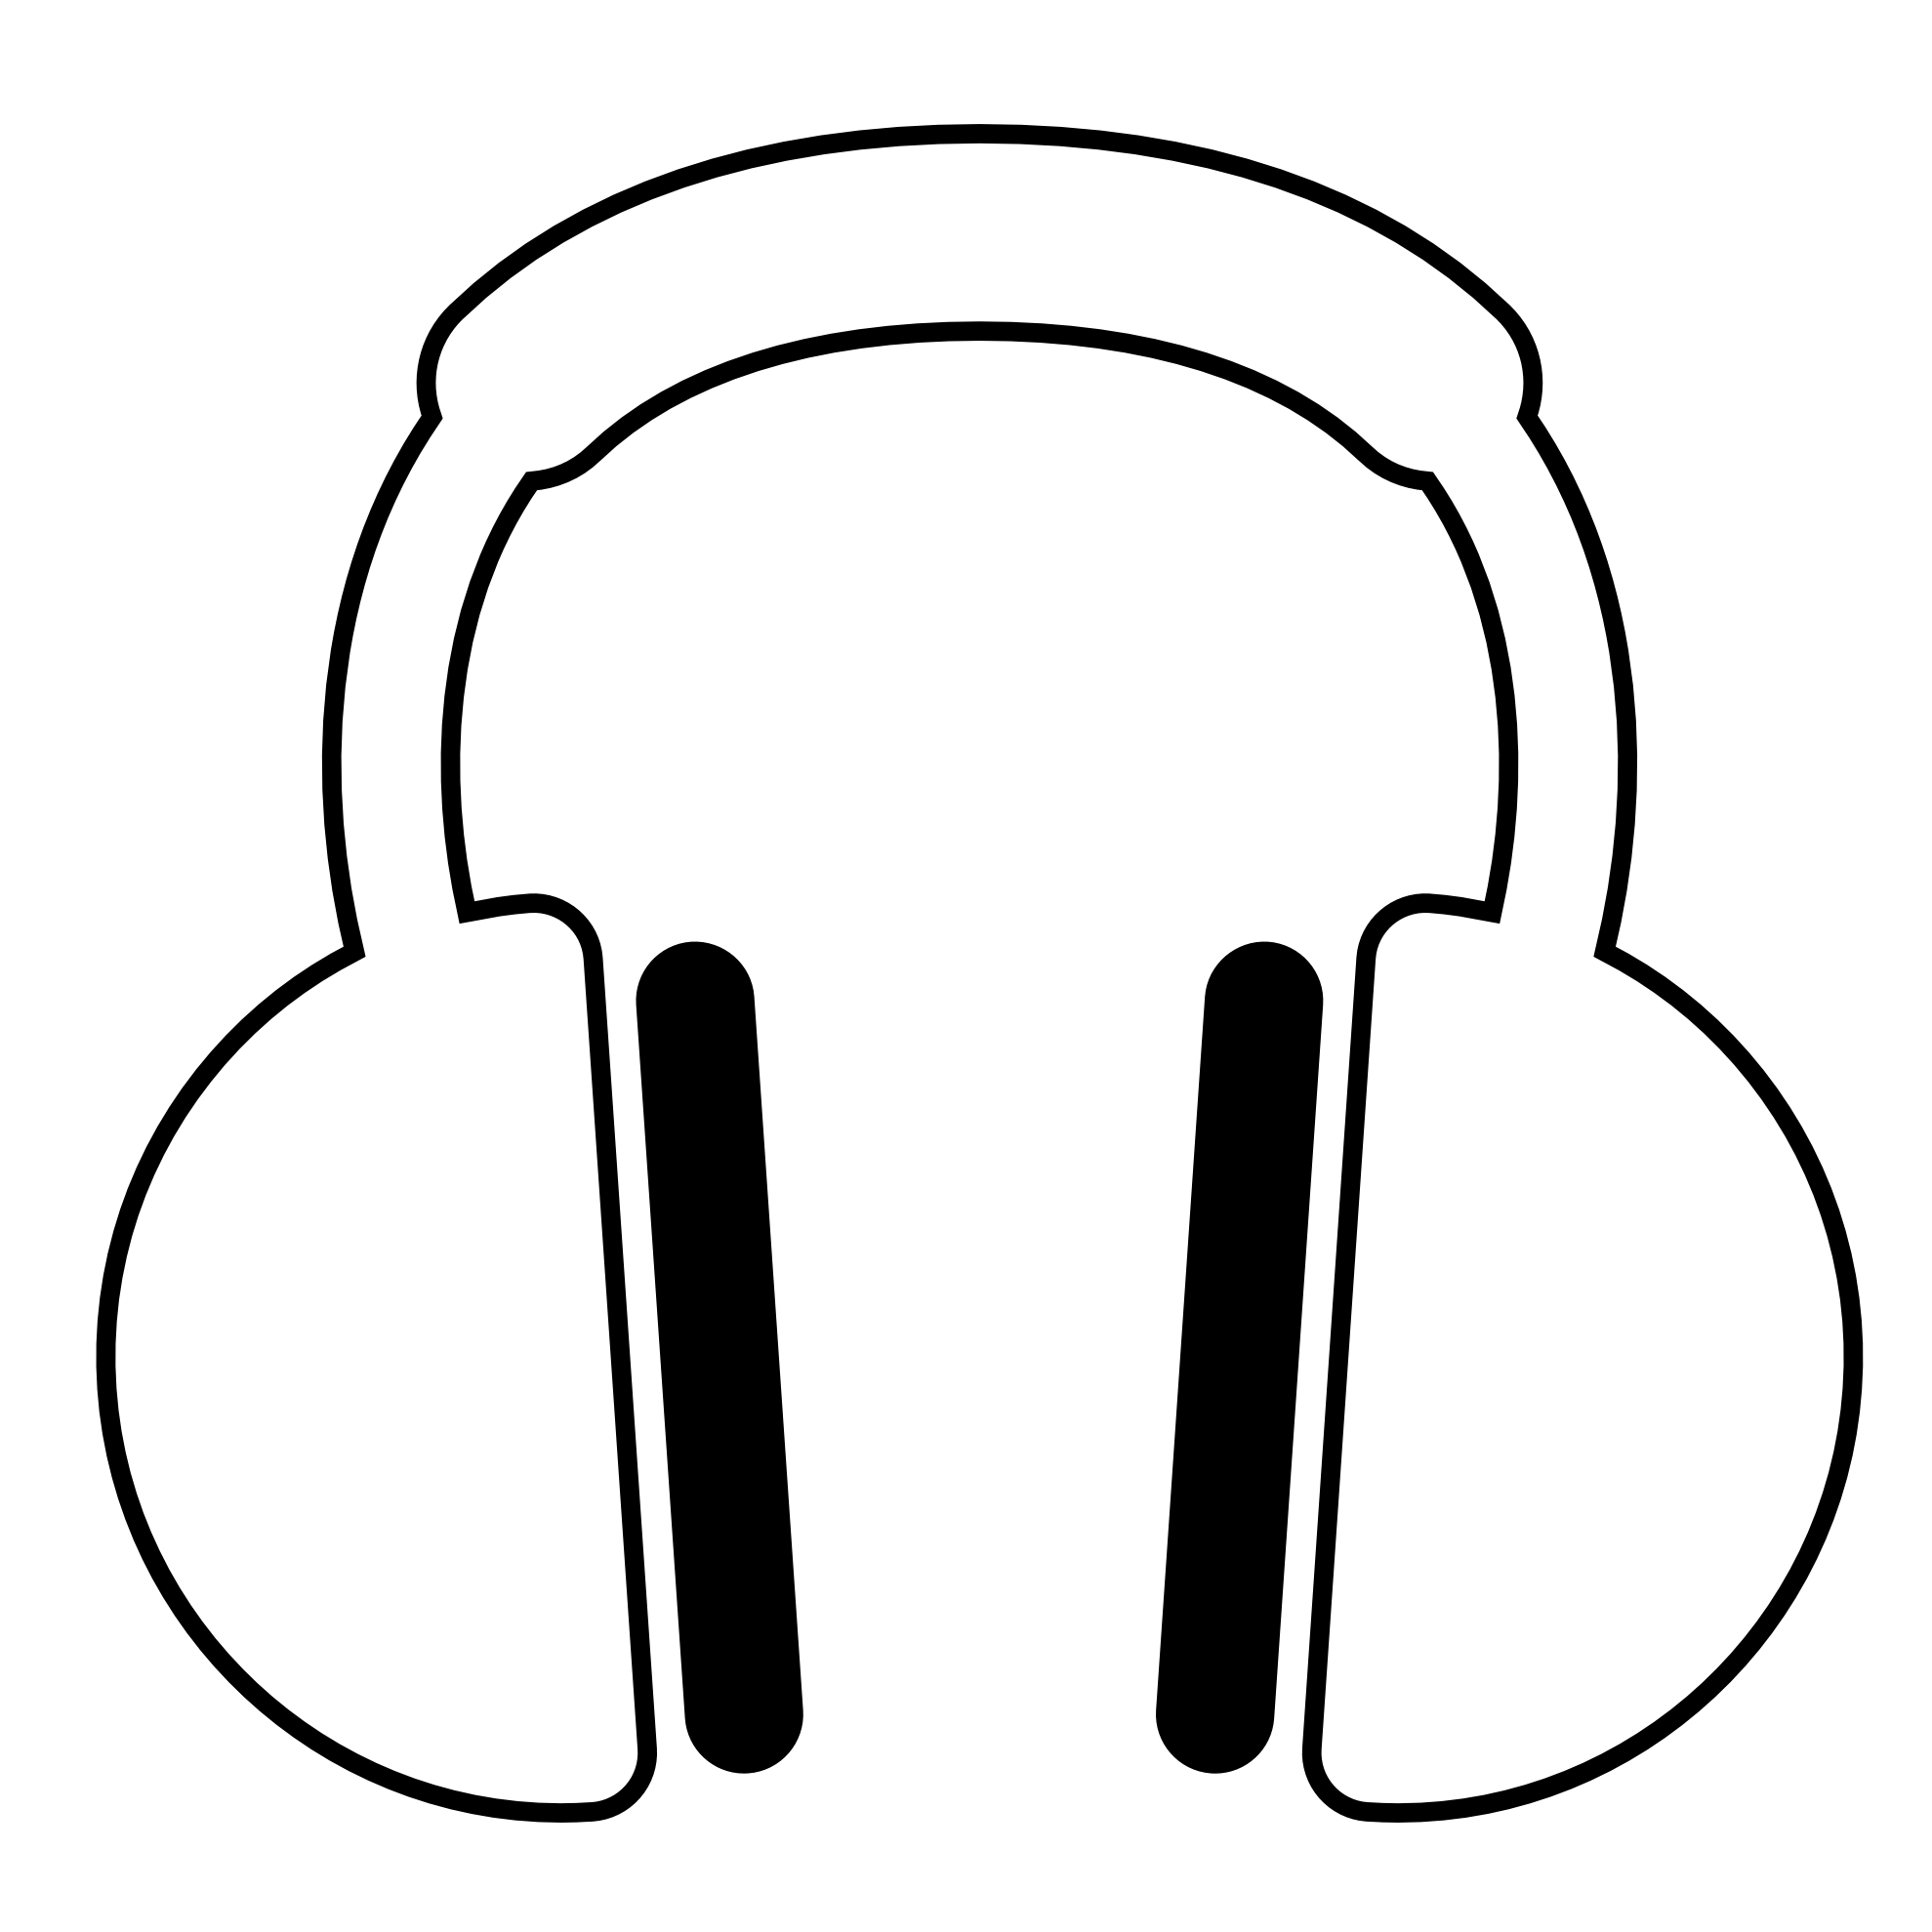 Headphones clipart dispatcher. Black and white klipsch